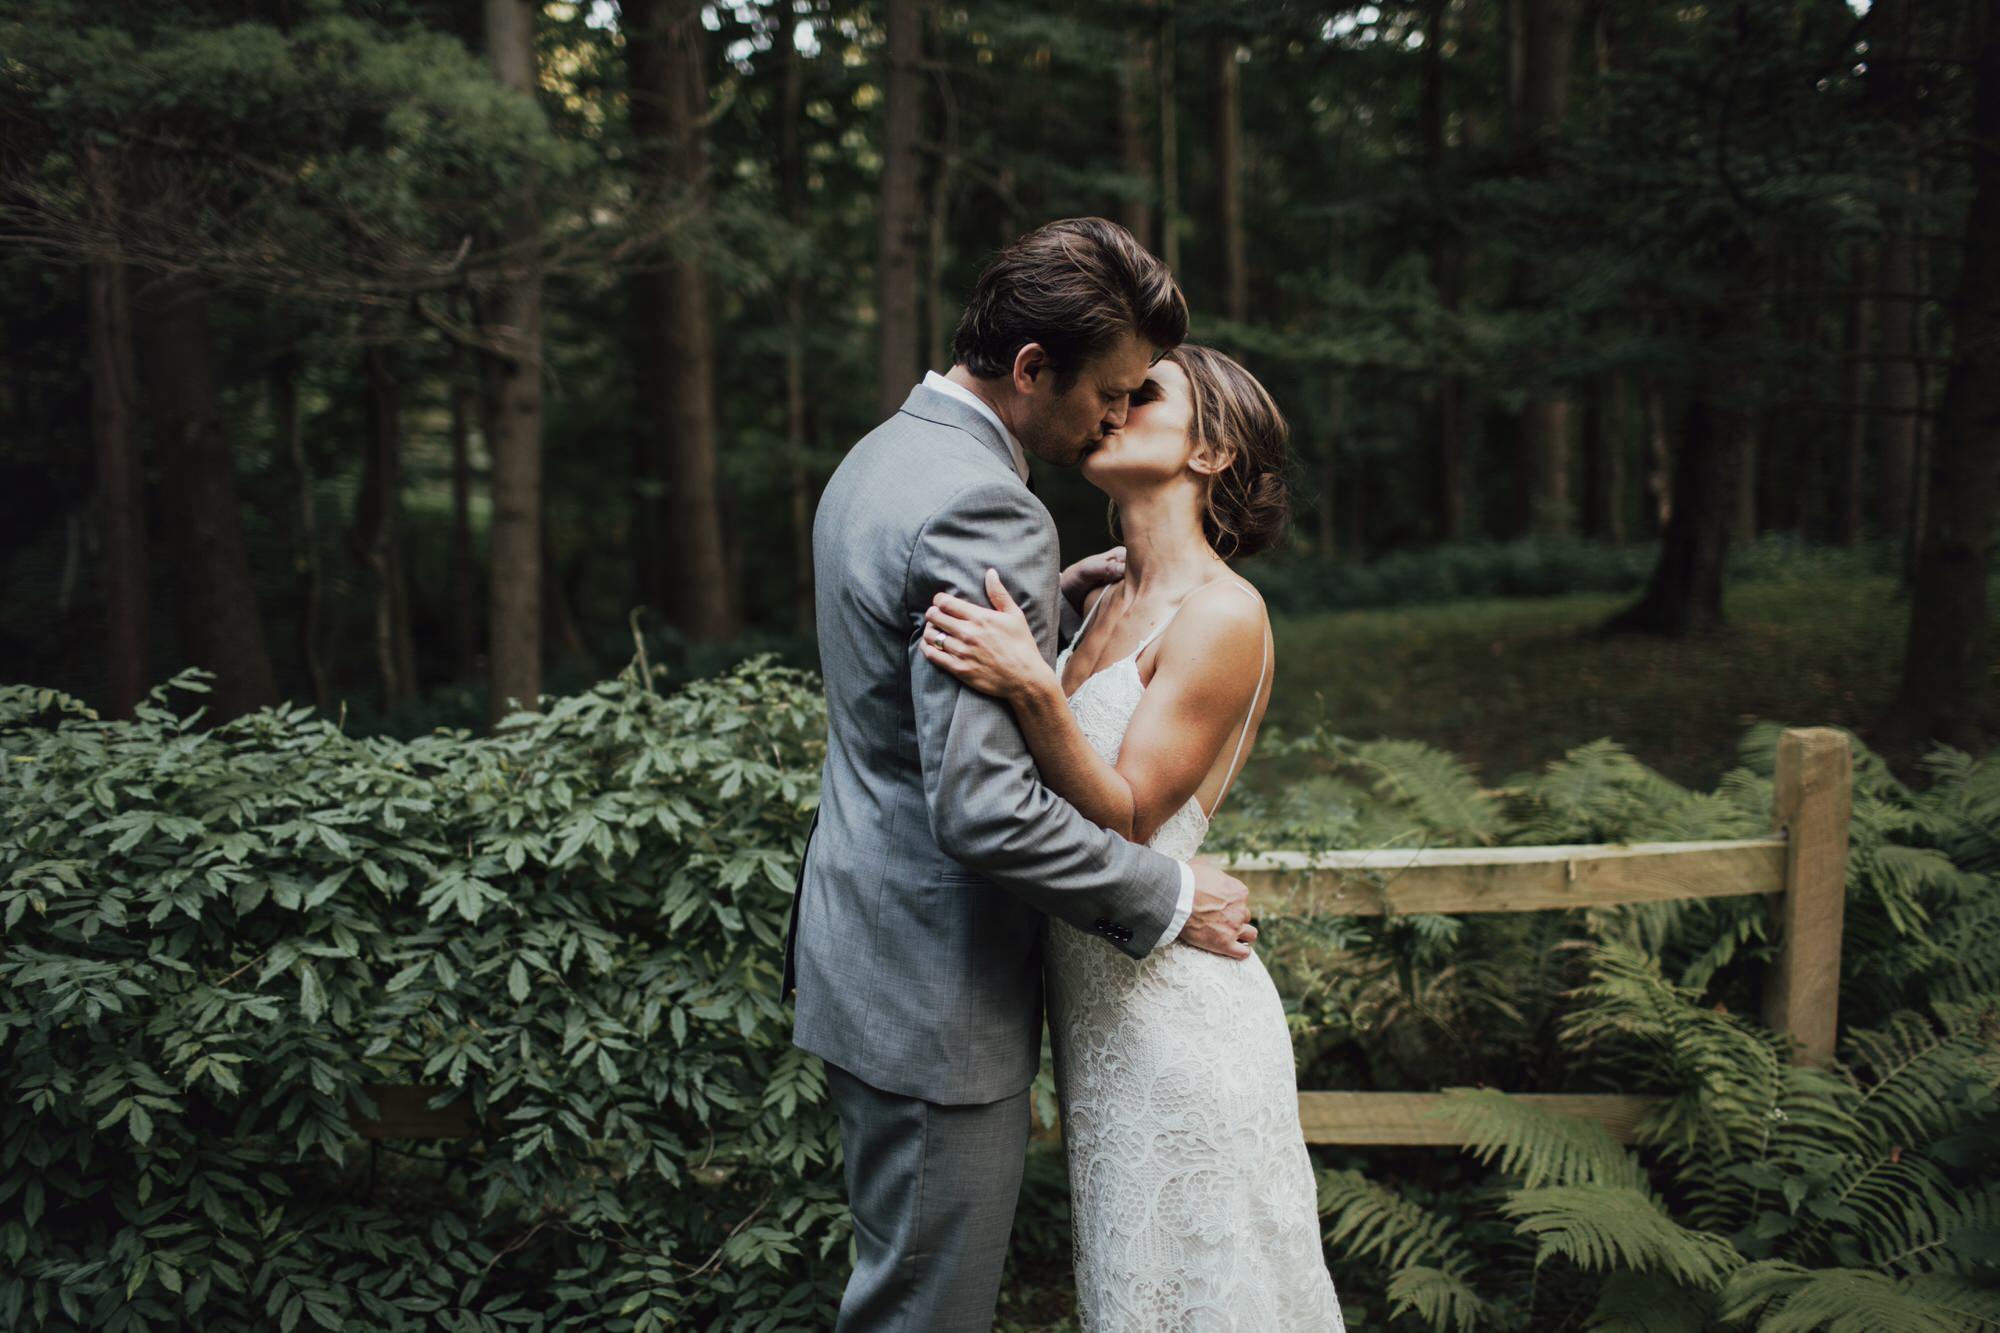 emily-aaron-rochester-new-york-wedding-photographer-103.JPG